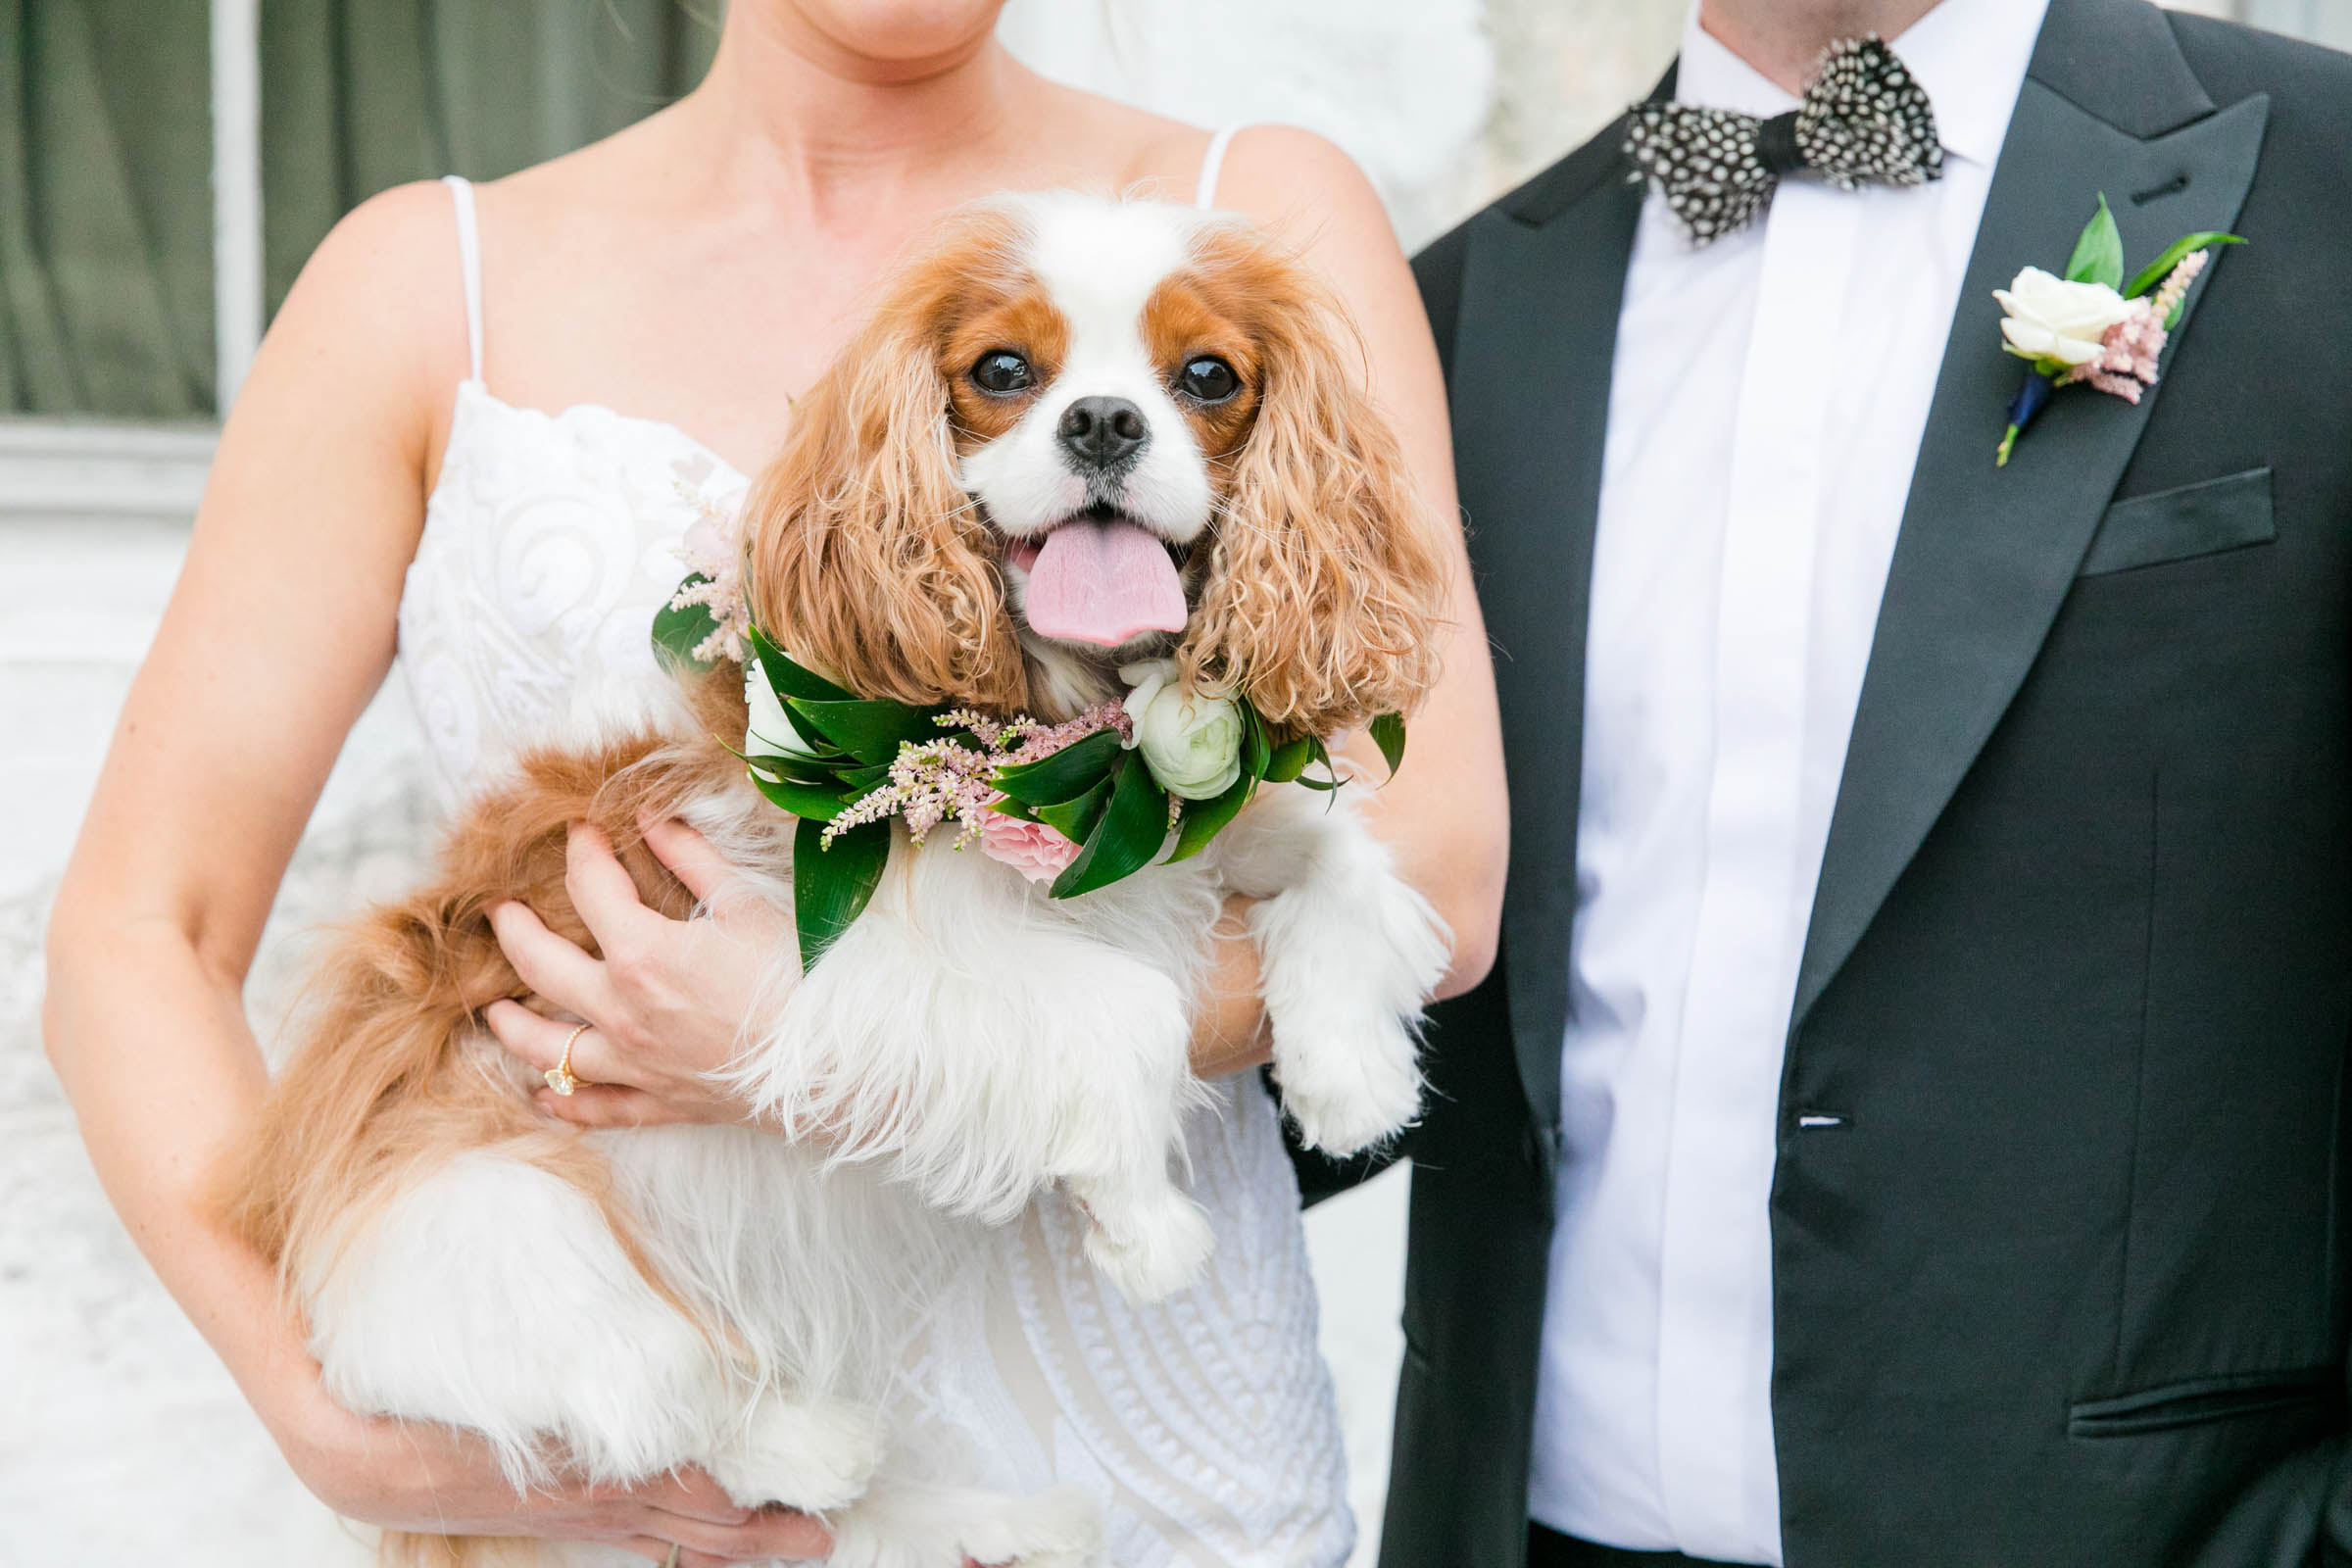 groom-and-bride-holding-dog-worlds-best-wedding-photos-2020-dana-cubbage-weddings